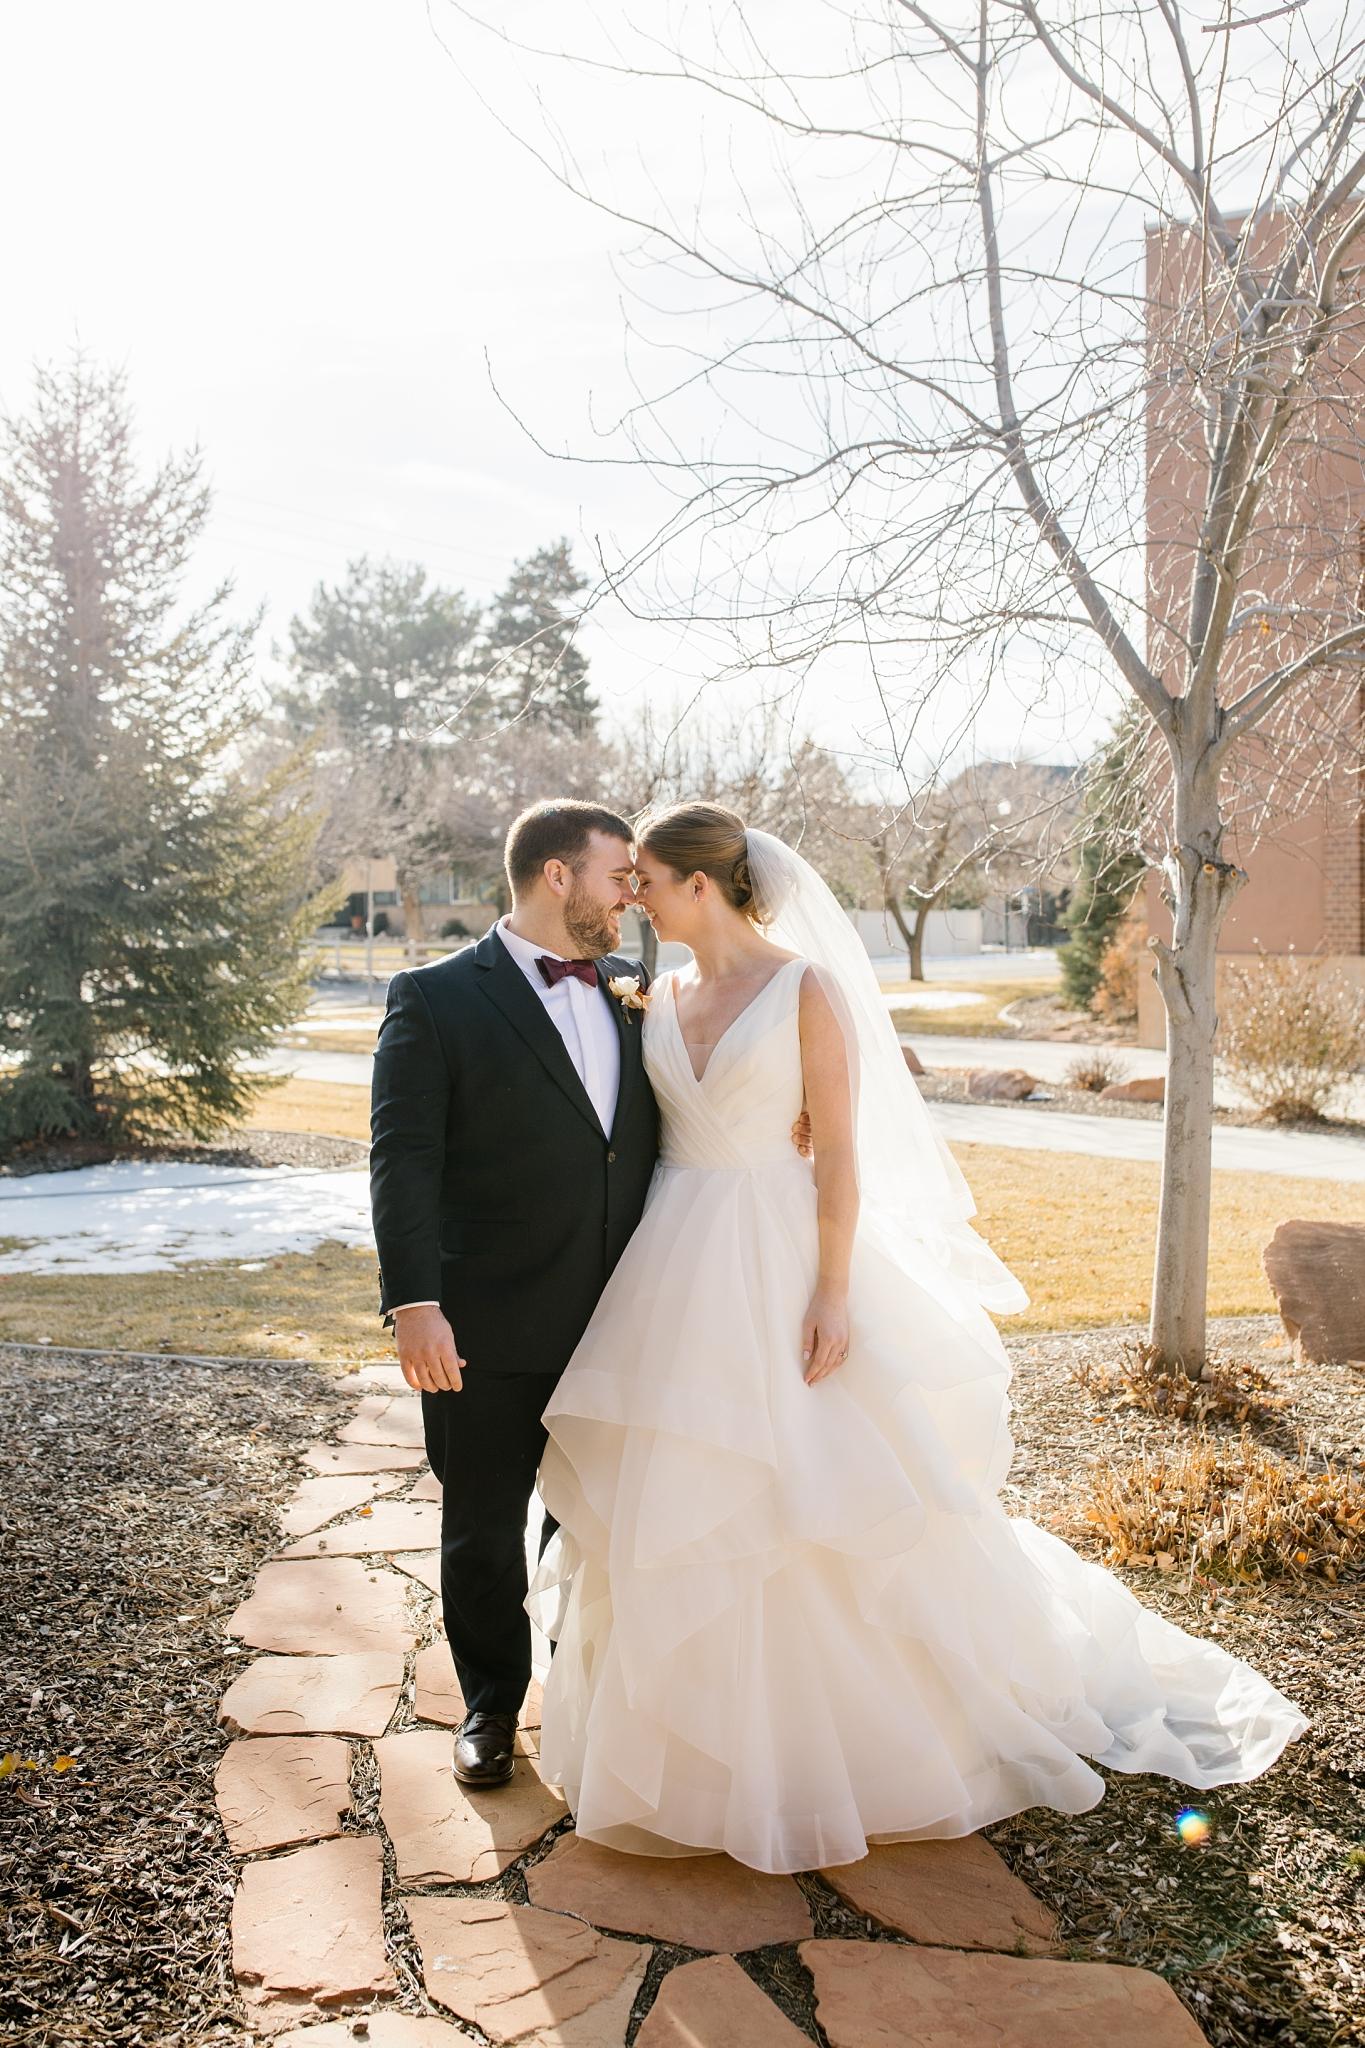 CN-Wedding-50_Lizzie-B-Imagery-Utah-Wedding-Photographer-Blessed-Sacrament-Catholic-Church-Sandy-Utah-The-Blended-Table-Salt-Lake-City.jpg